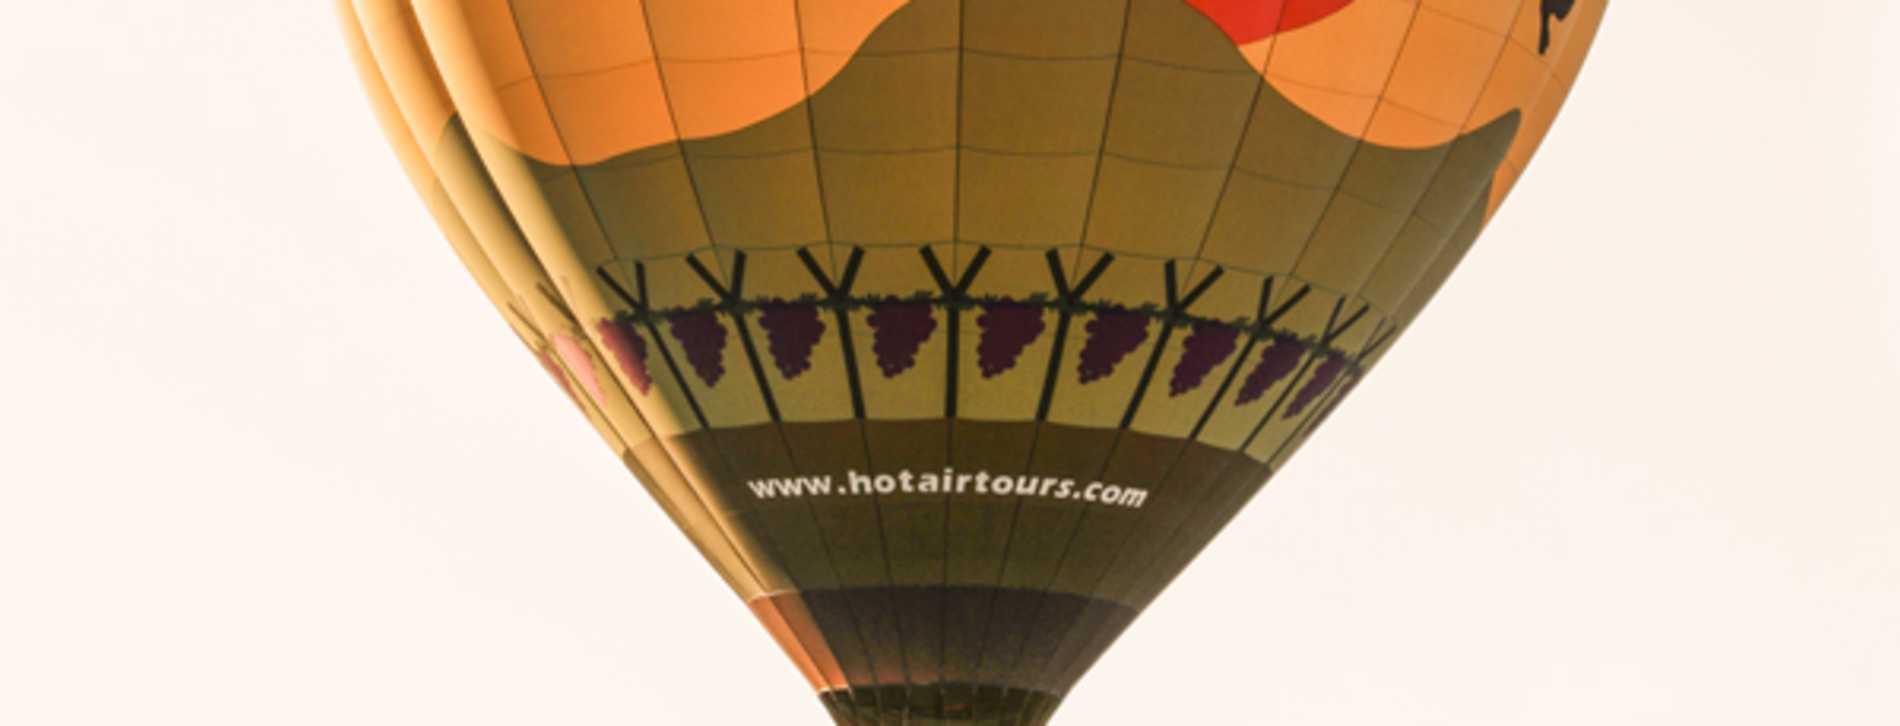 A Grape Escape Hot Air Balloon